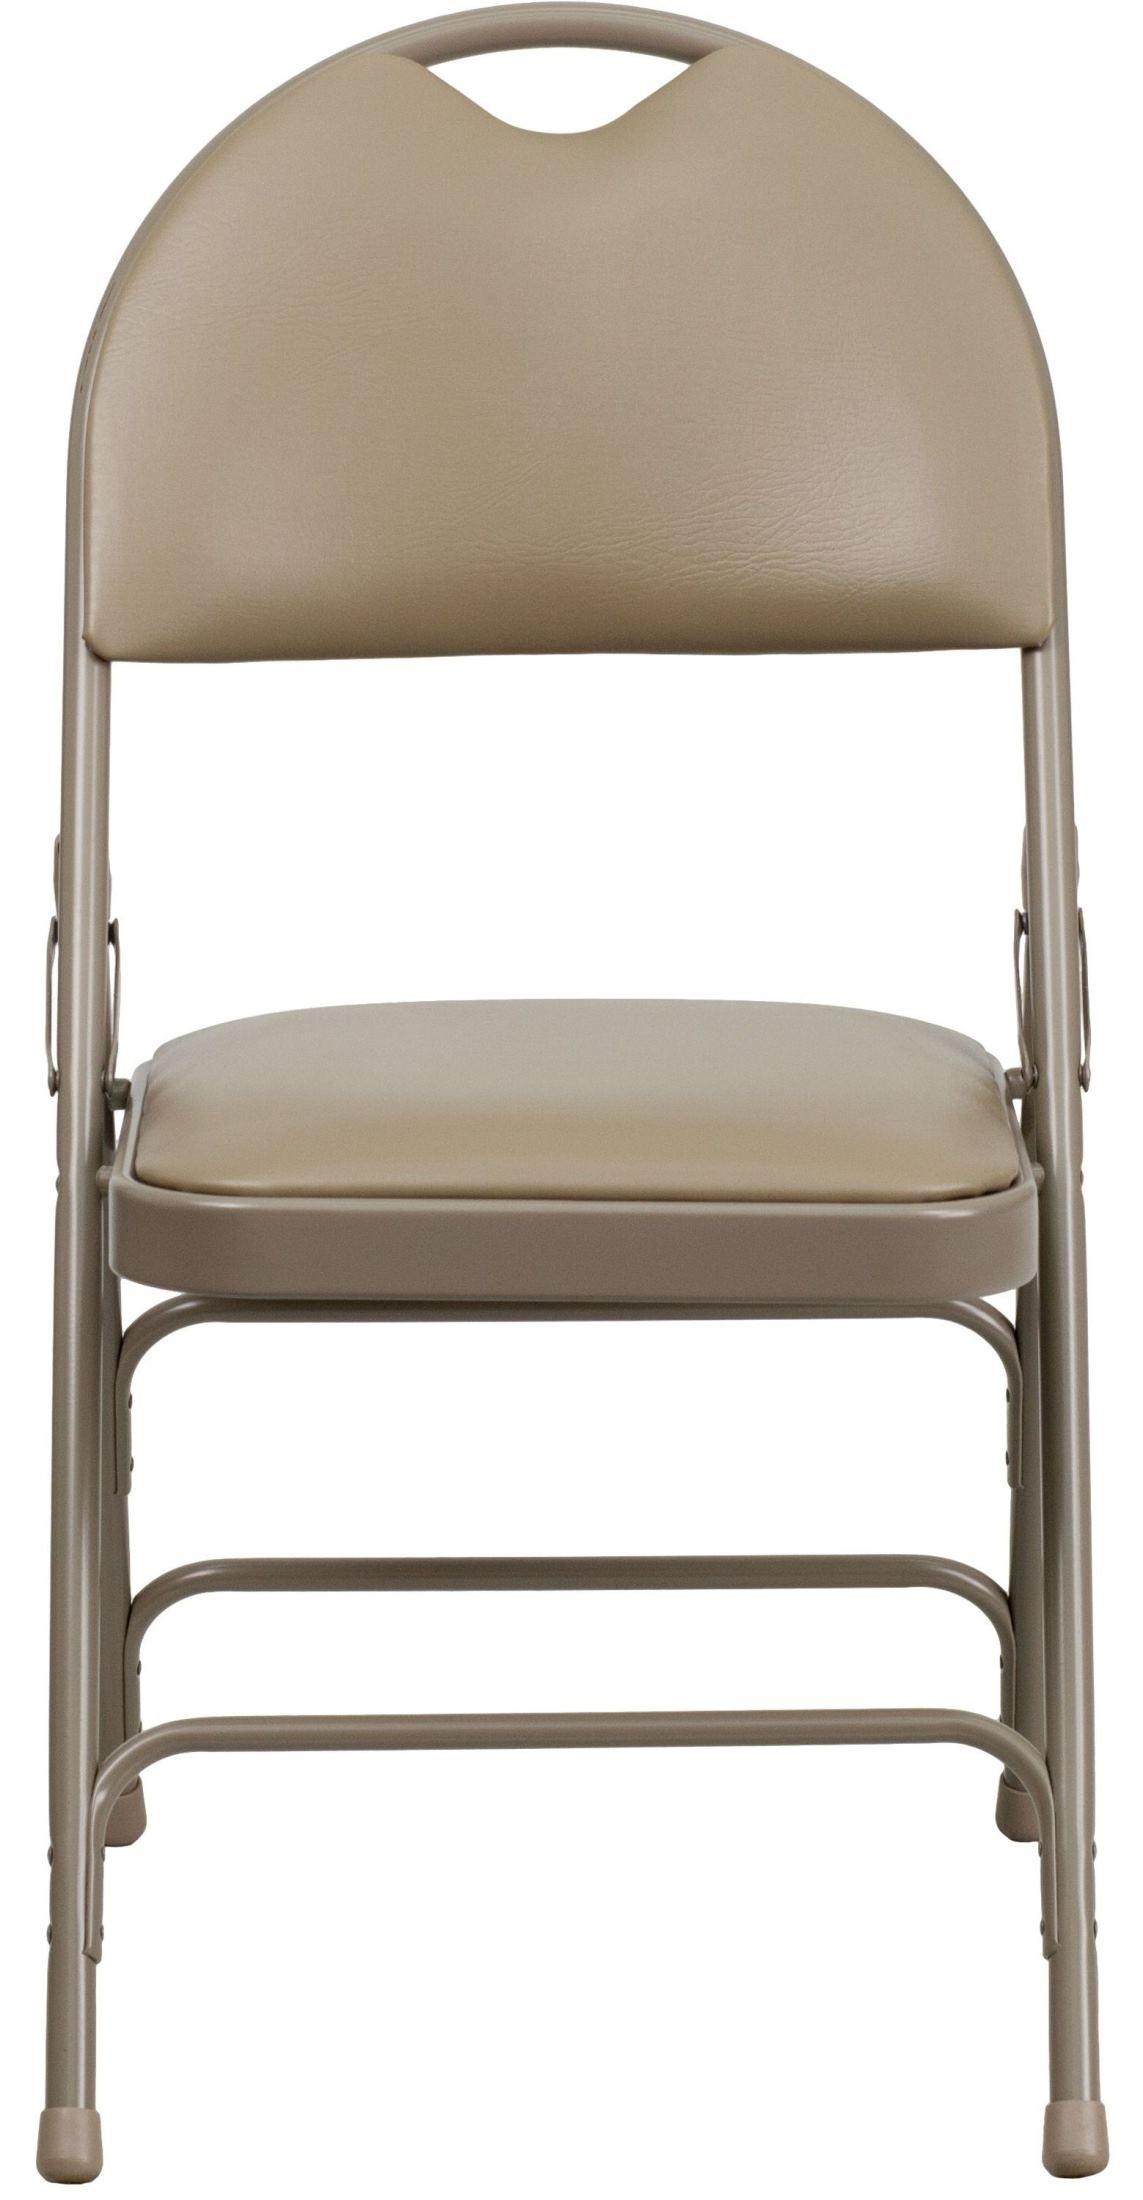 hercules folding chair for shower the elderly series ultra premium beige vinyl metal